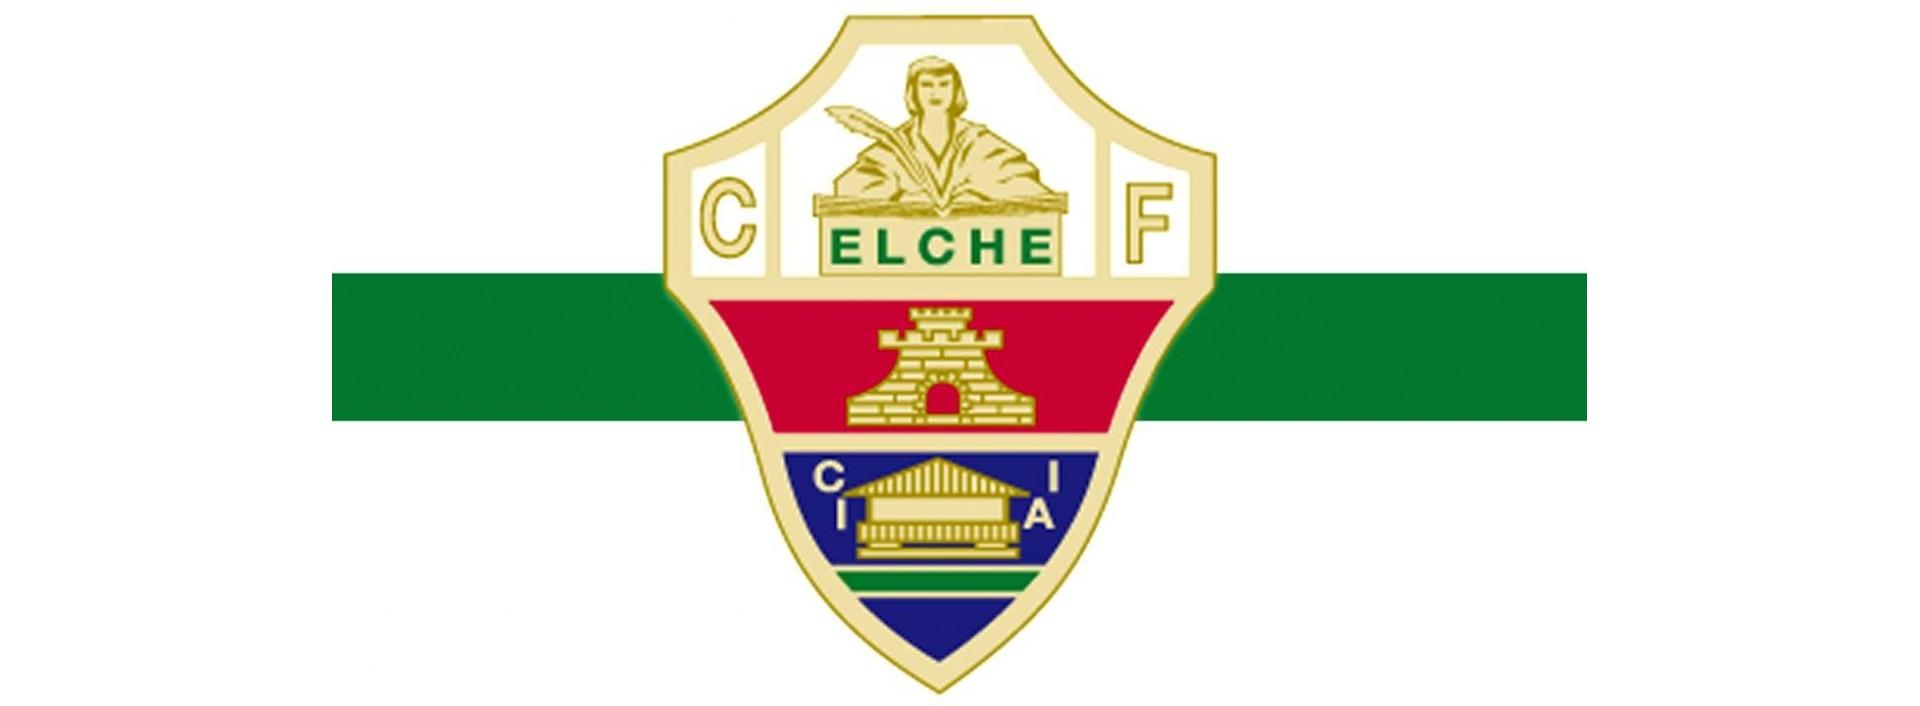 ELCHE C.F.